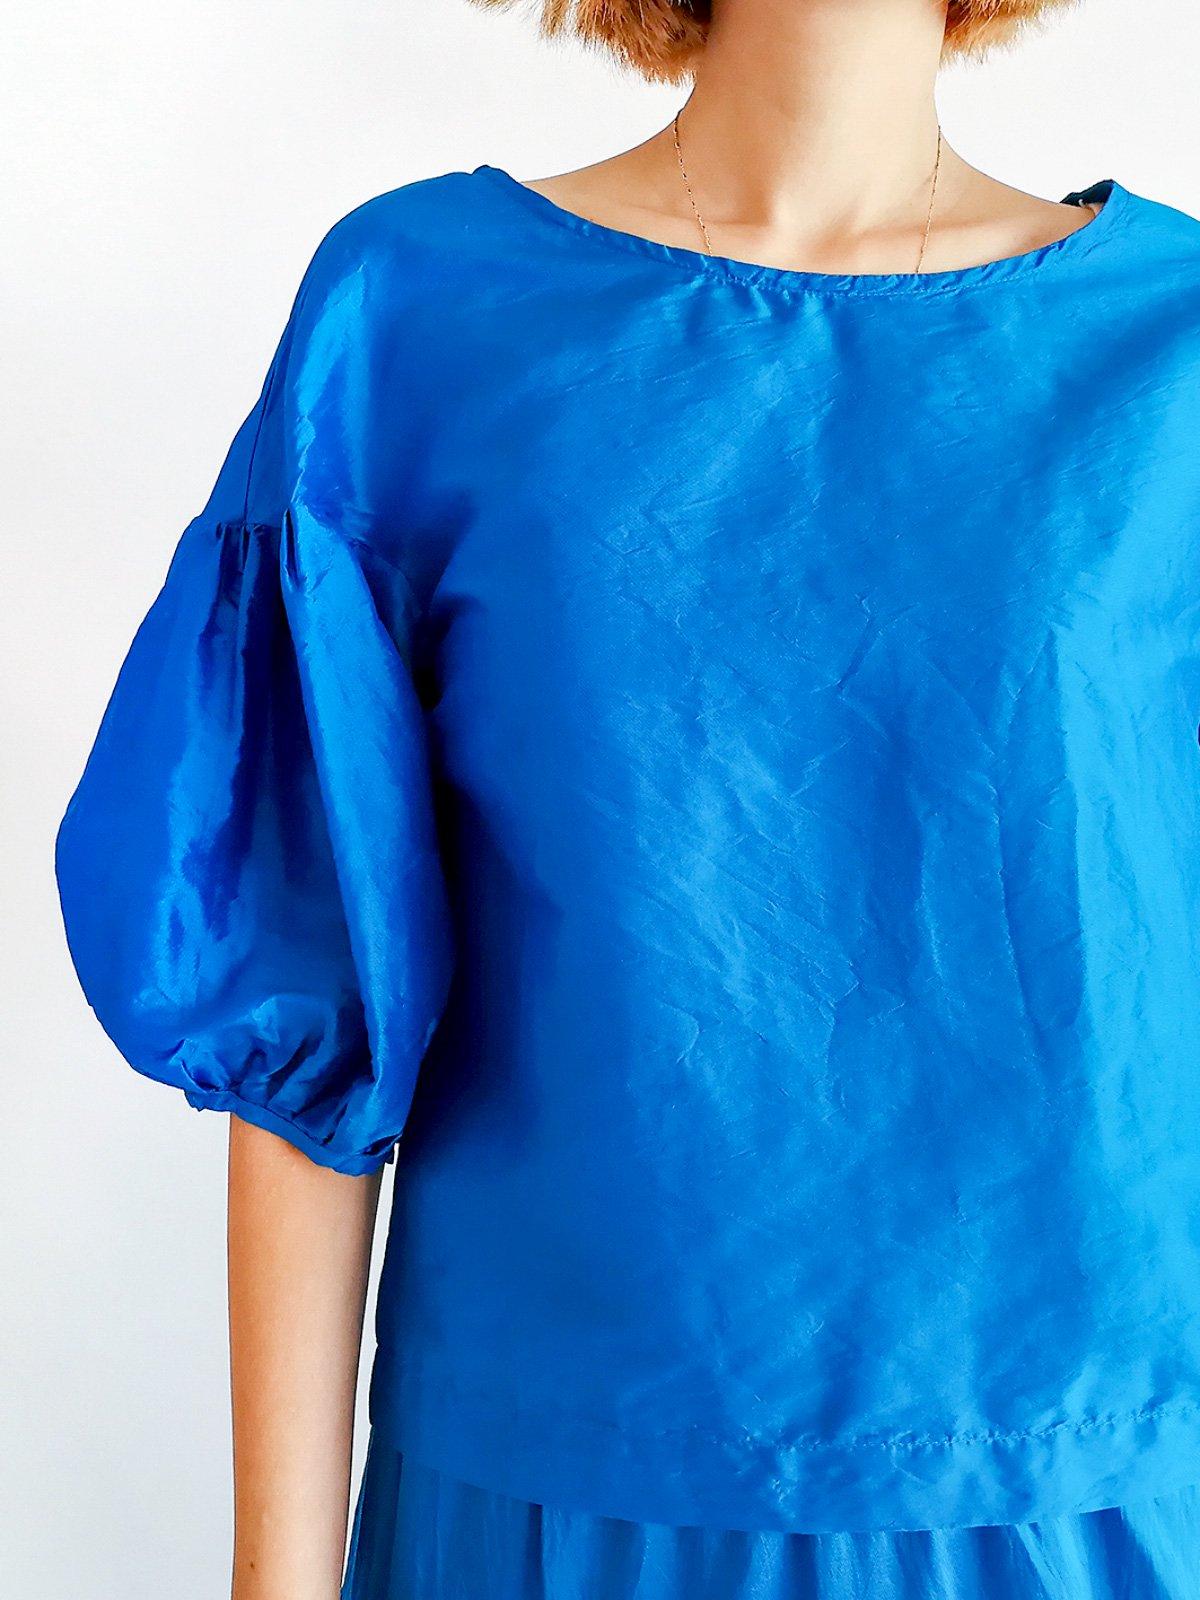 Puff Sleeve / turquoise